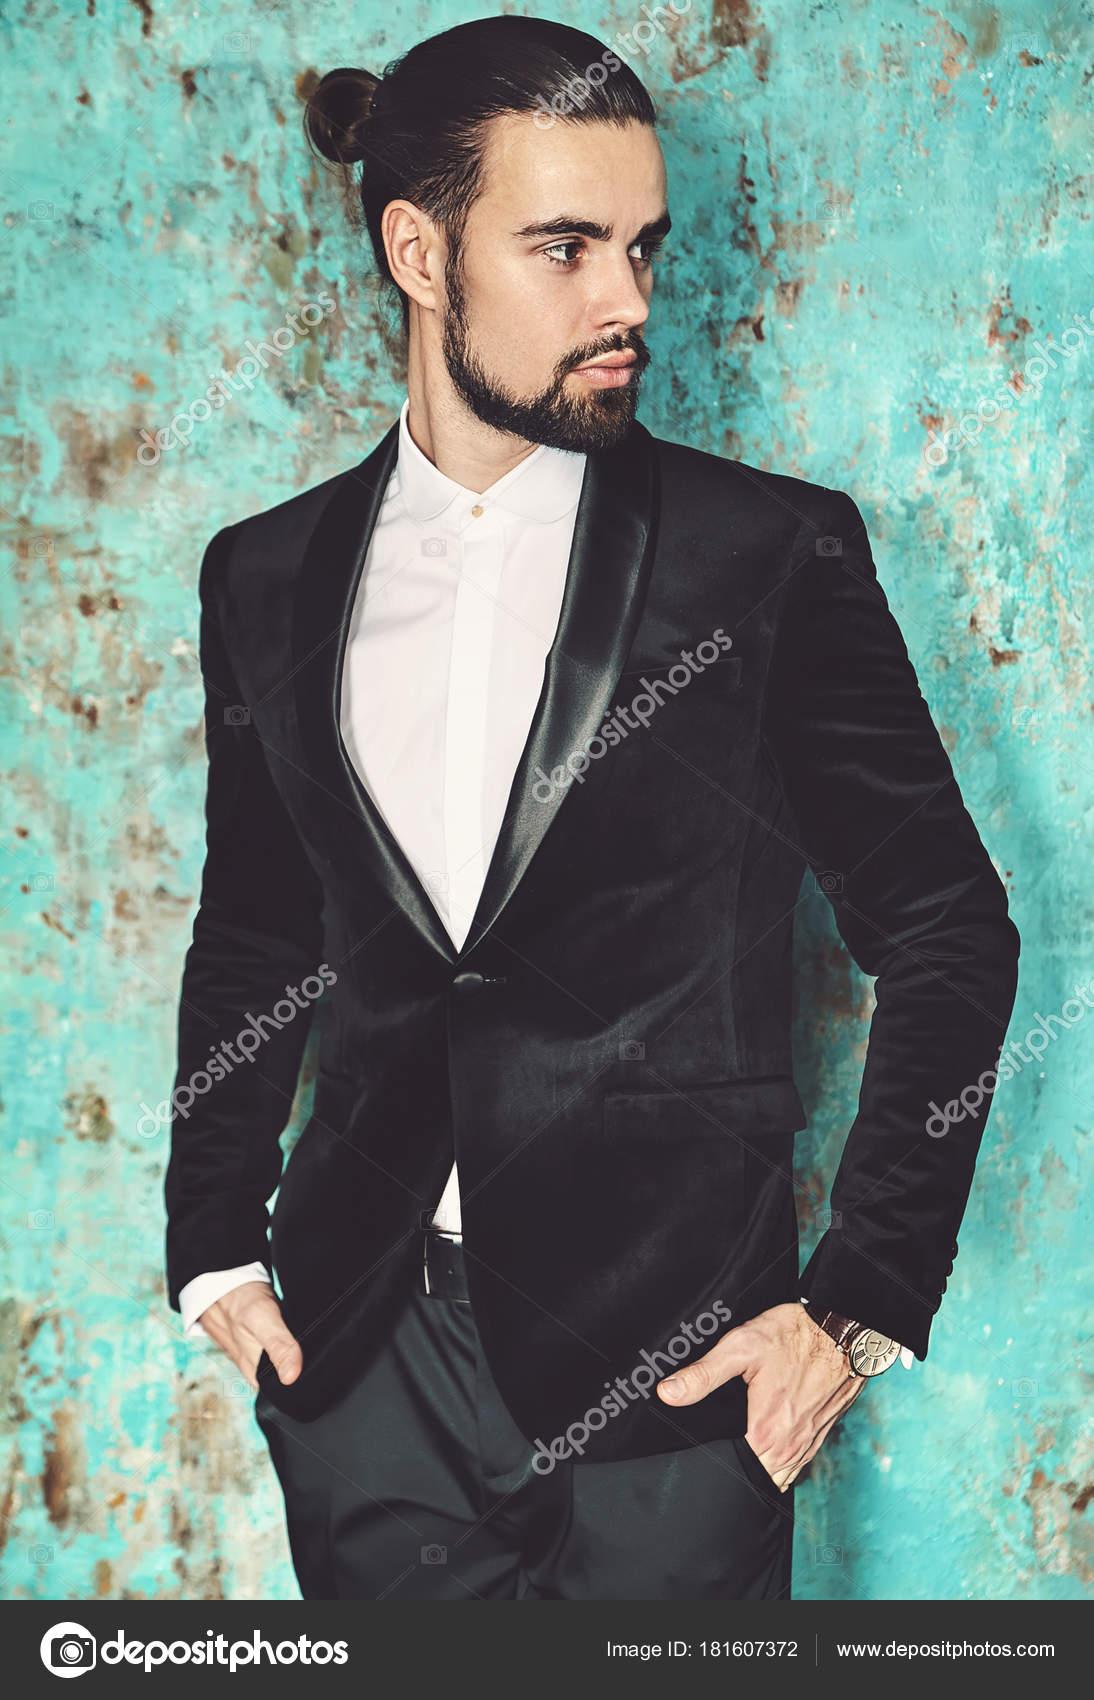 Vestidos formales hipster